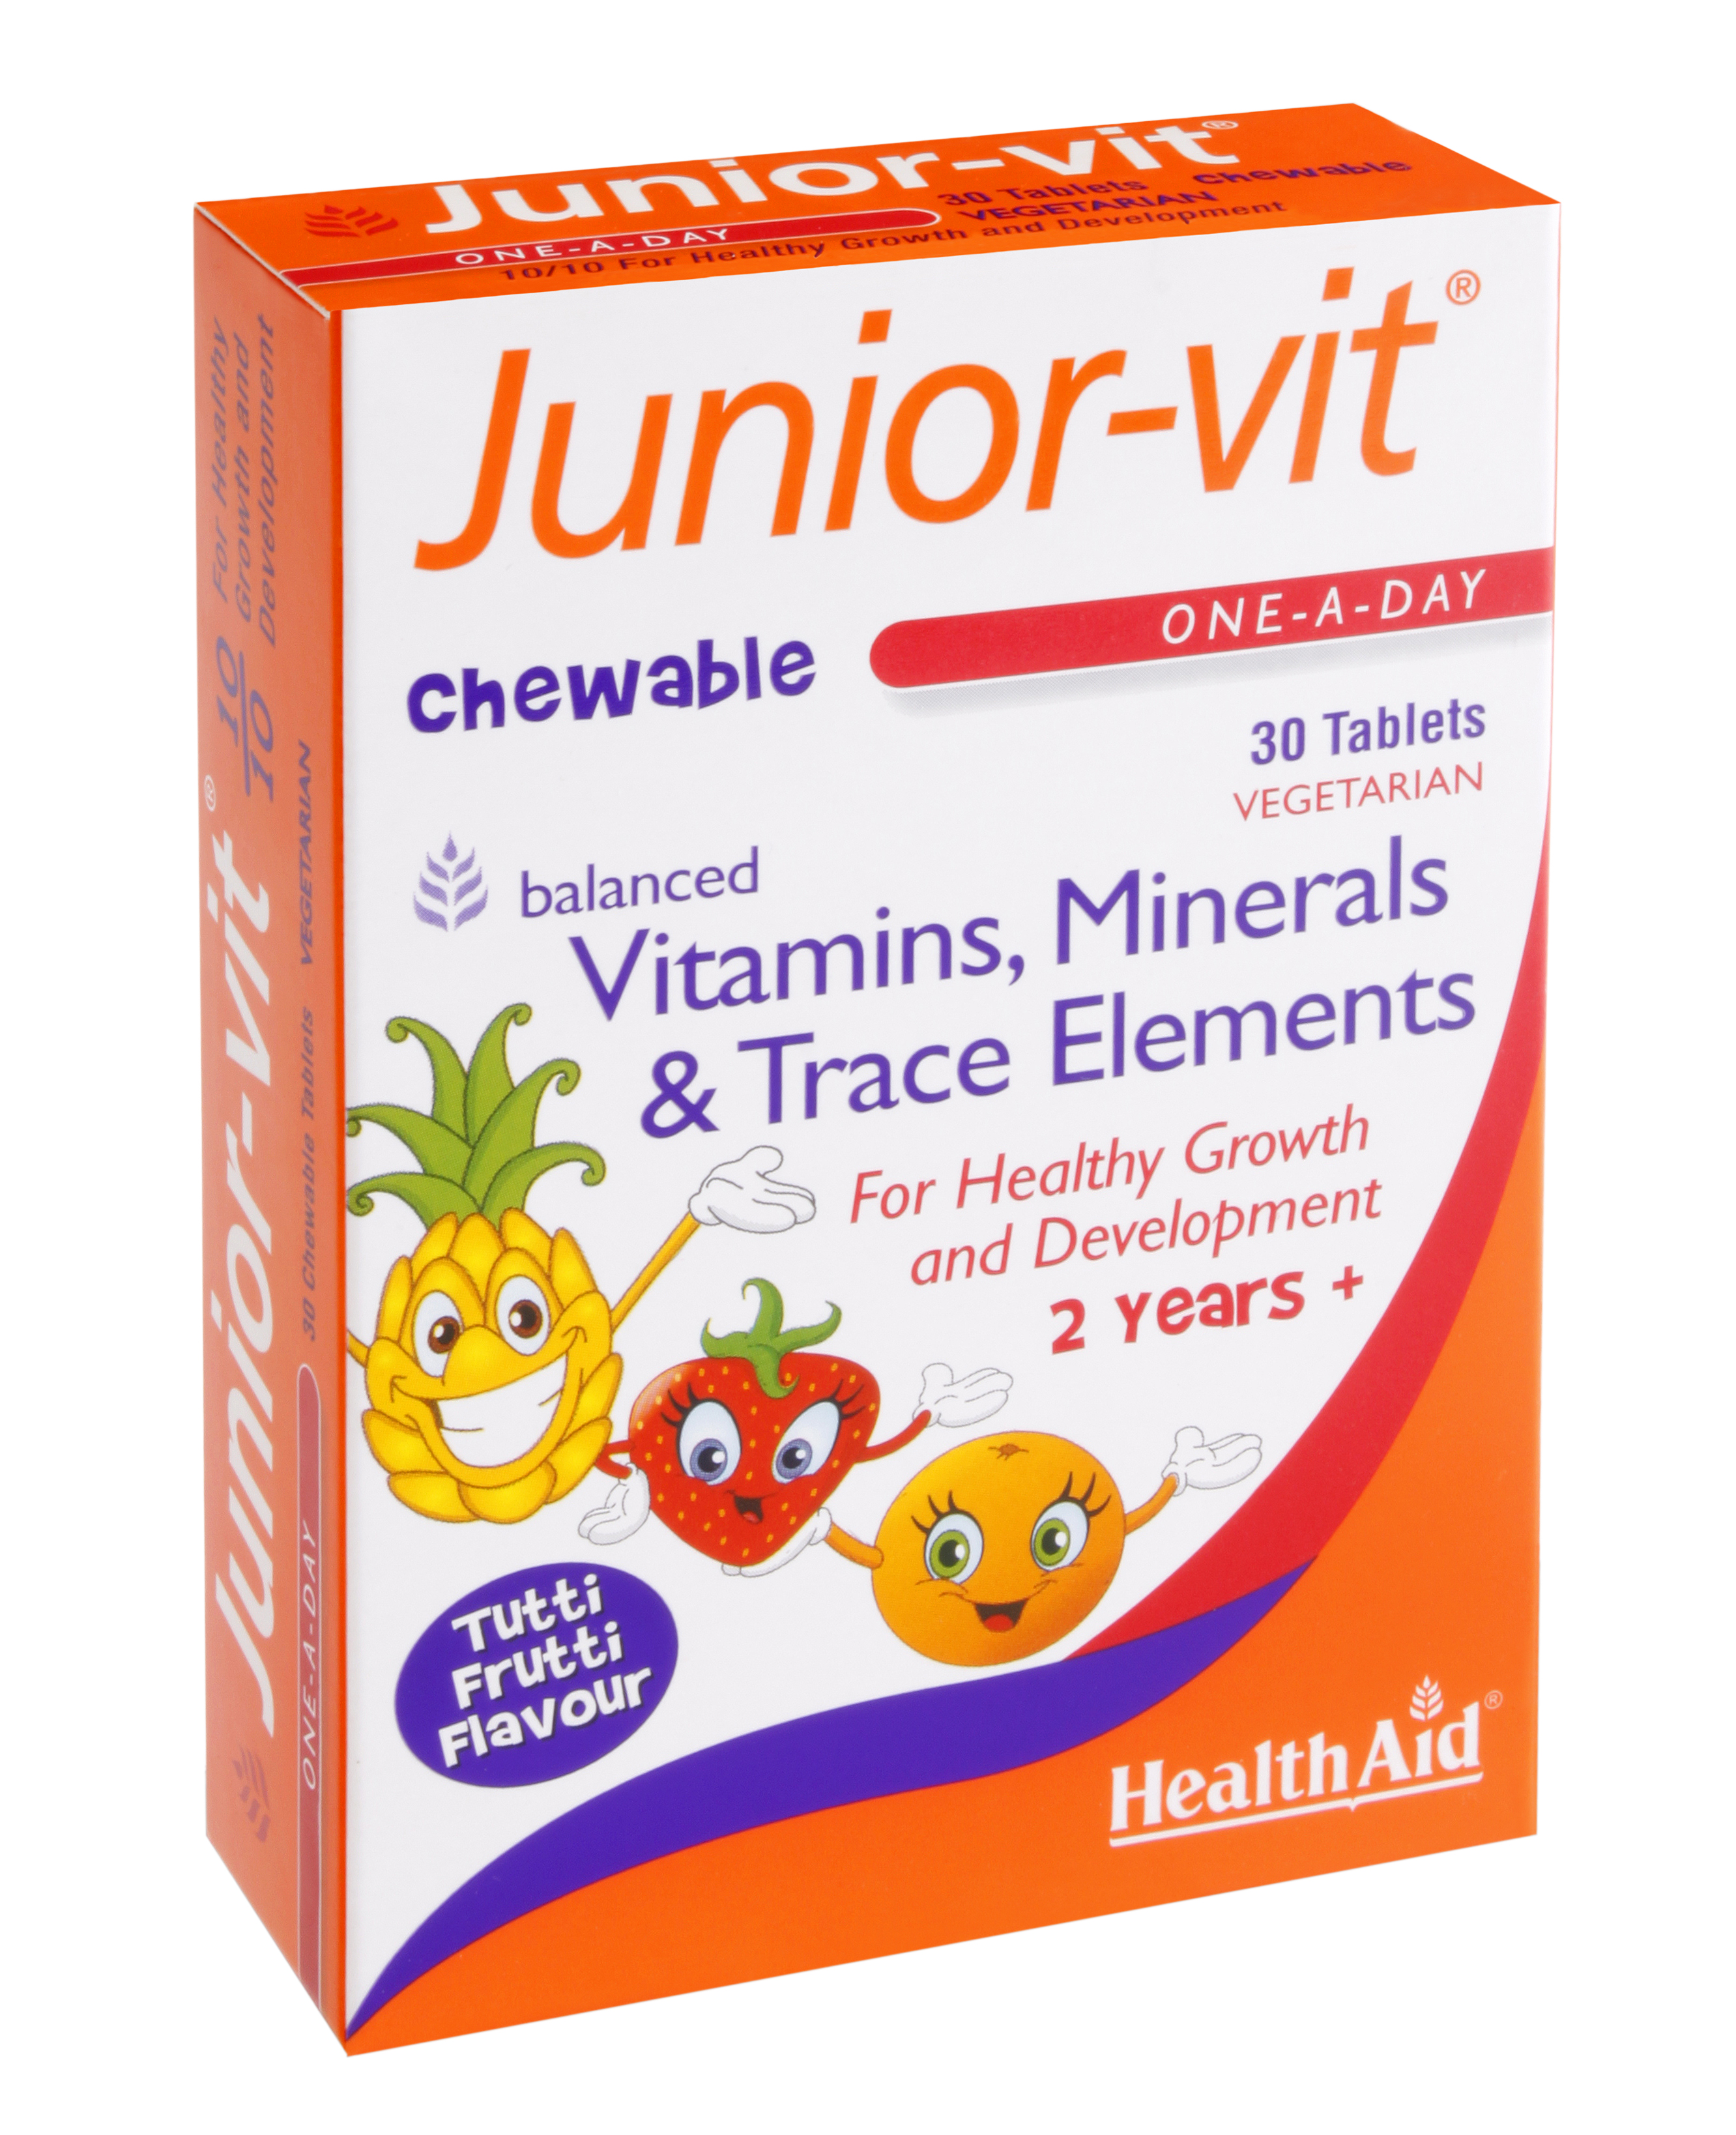 Health Aid Junior Vit Ισορροπημένη Πολυβιταμινούχος Σύνθεση Ειδική Για Παιδιά 30tabs